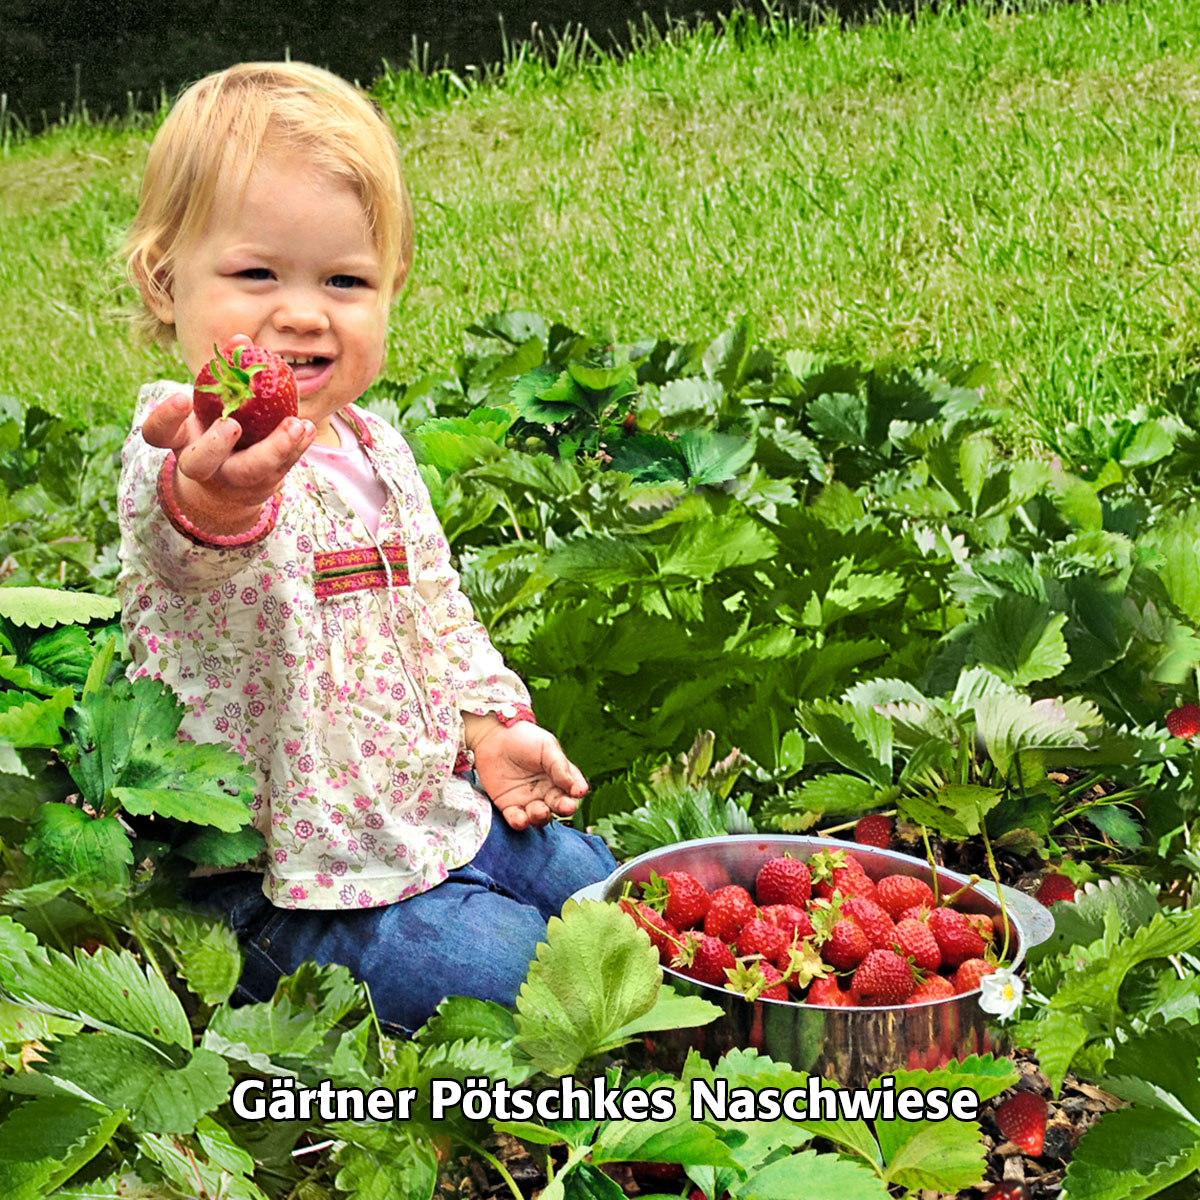 Gärtner Pötschkes Erdbeersorten Auslese, getopft | #4